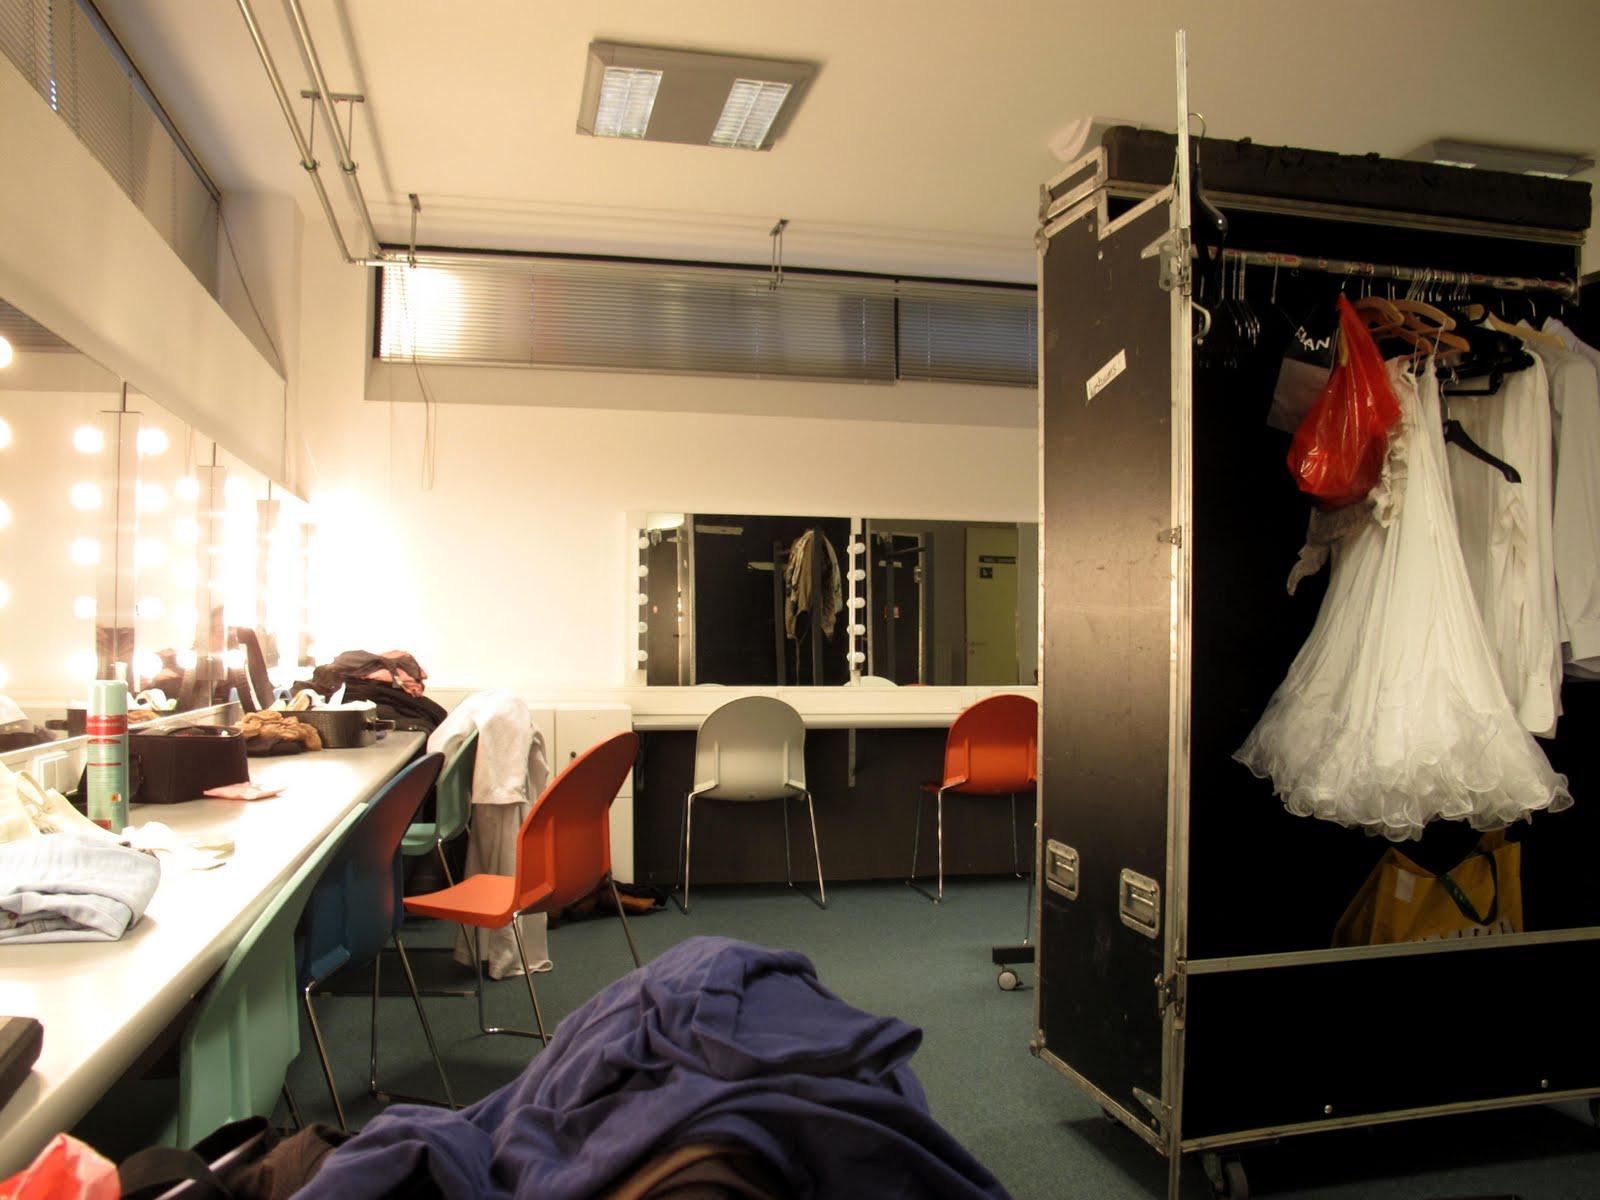 Medea dinsdag 6 april zutphen de hanzehof - Grote kleedkamer ...